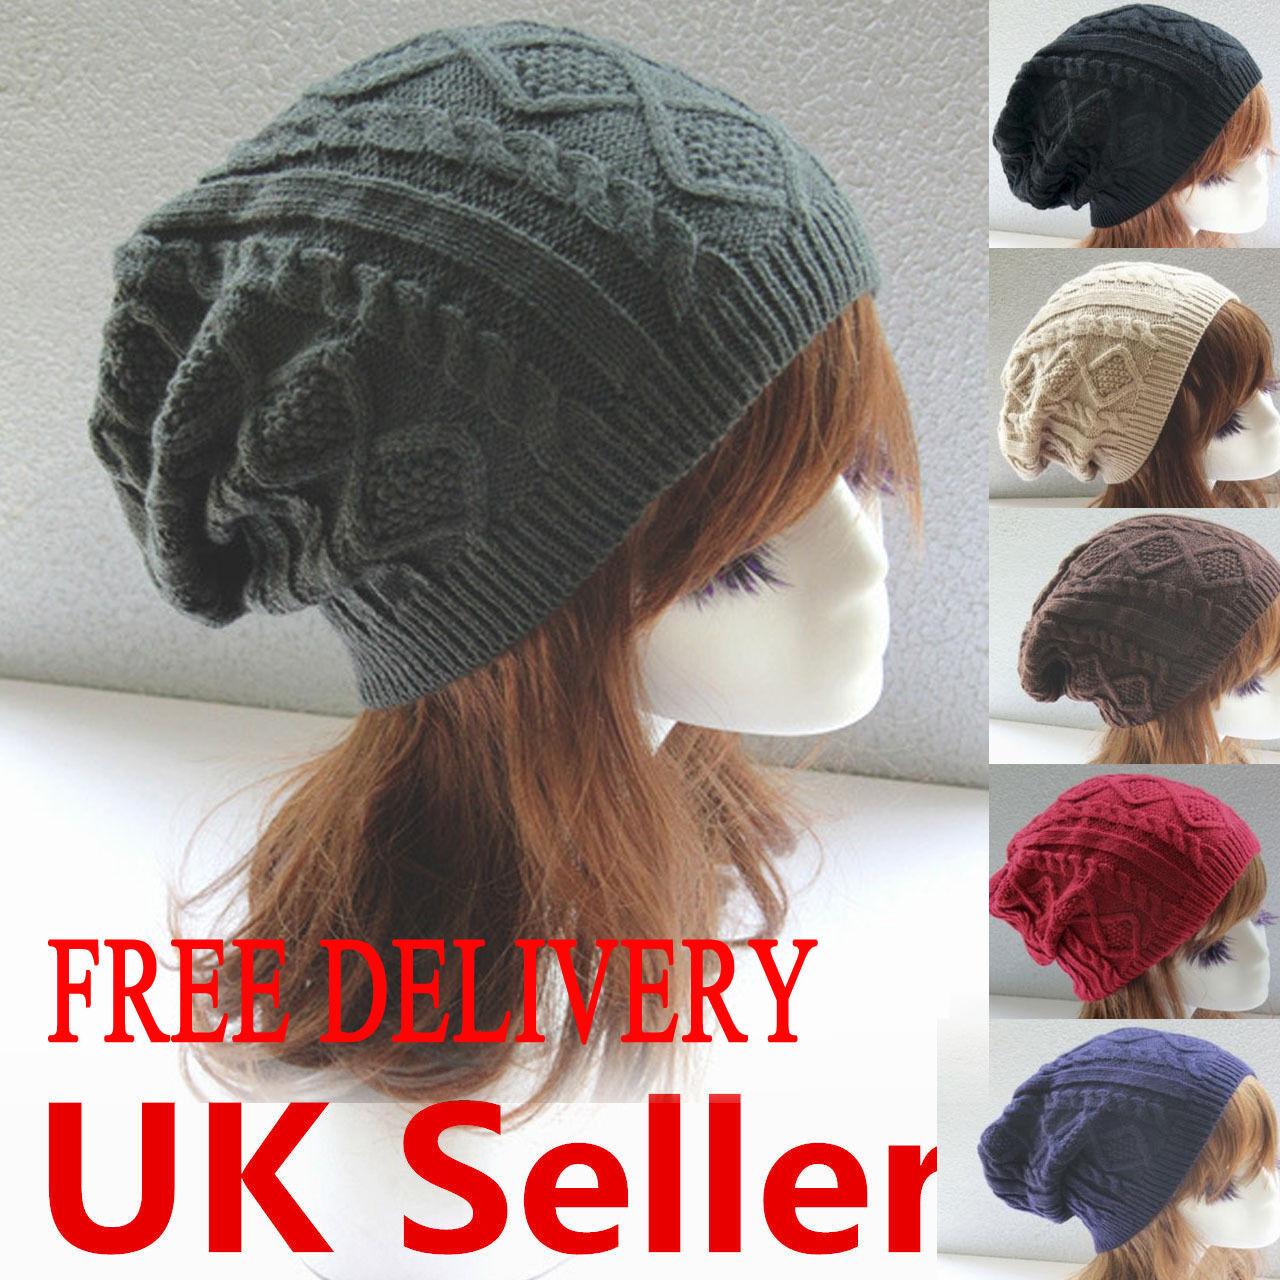 Mens Ladies Knitted Soft Woolly Winter Oversized Ski Beanie Hat Cap skateboard